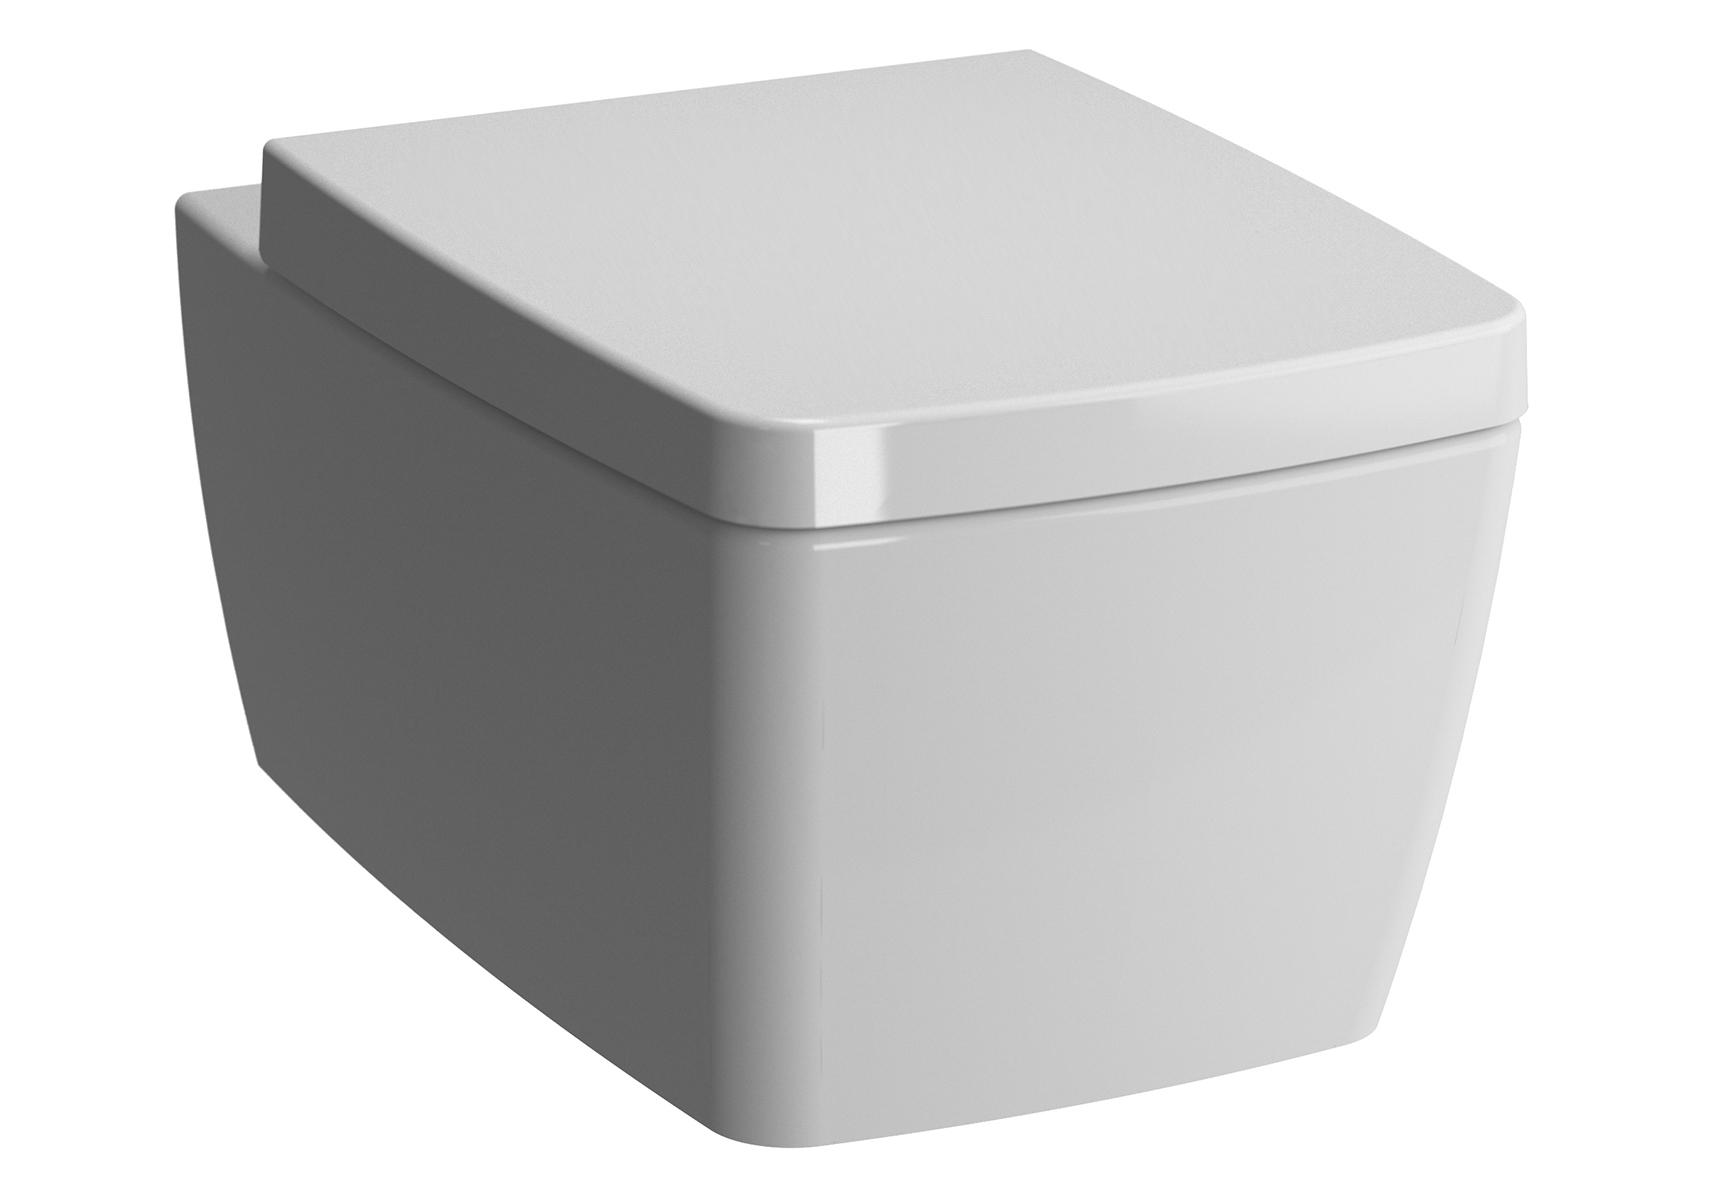 Metropole Pack WC suspendu abattant Duroplast, fermeture douce